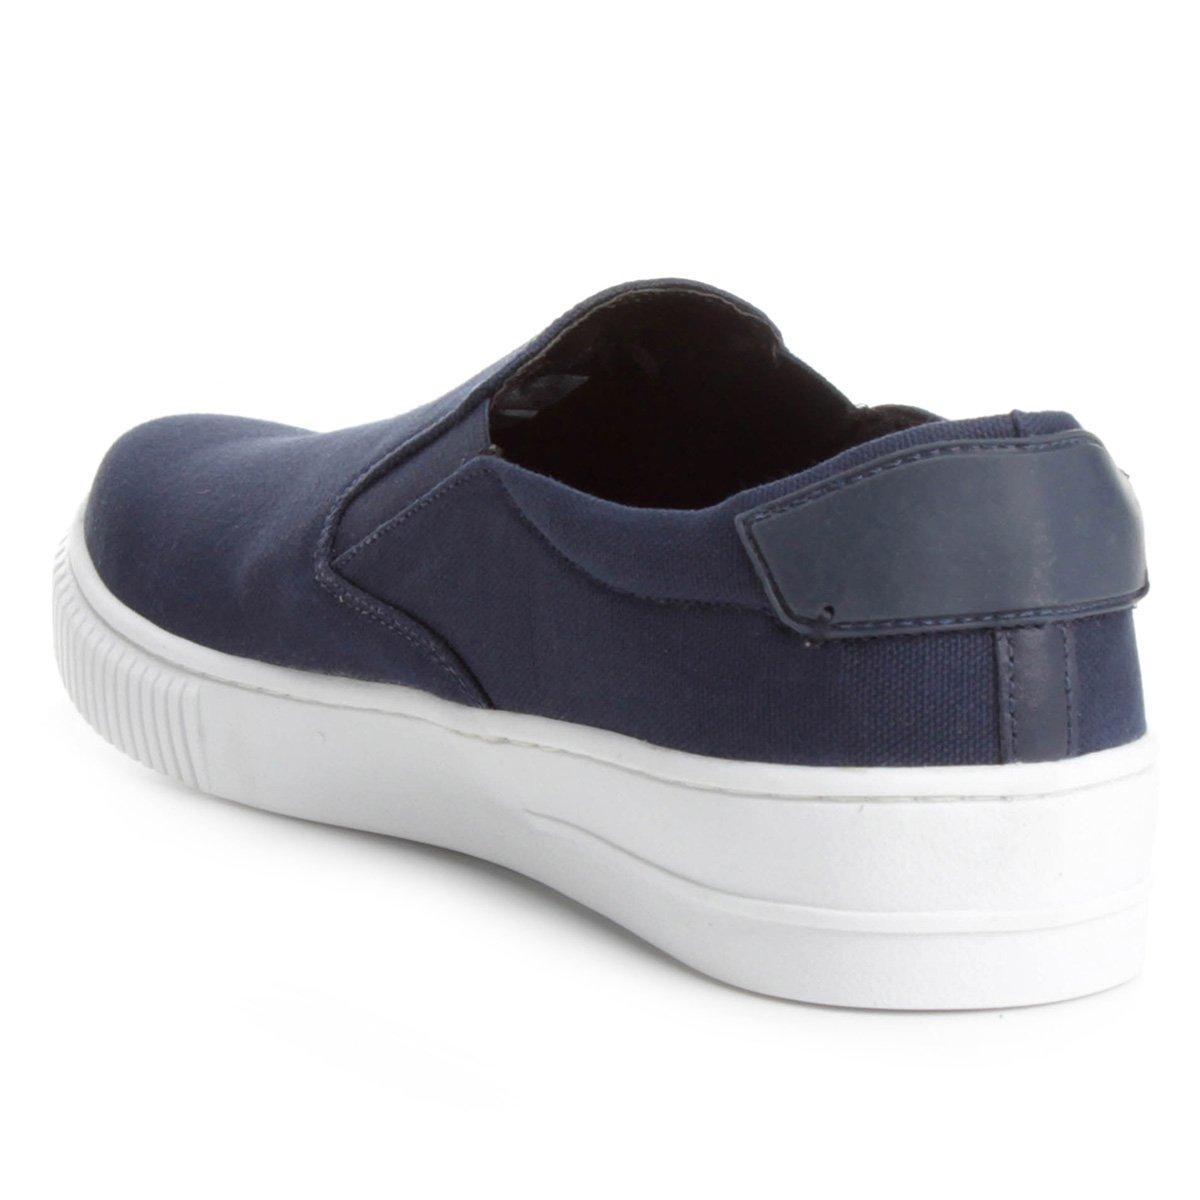 bd25015f7aa8b Slip On Calvin Klein Iate Masculino - Compre Agora   Netshoes